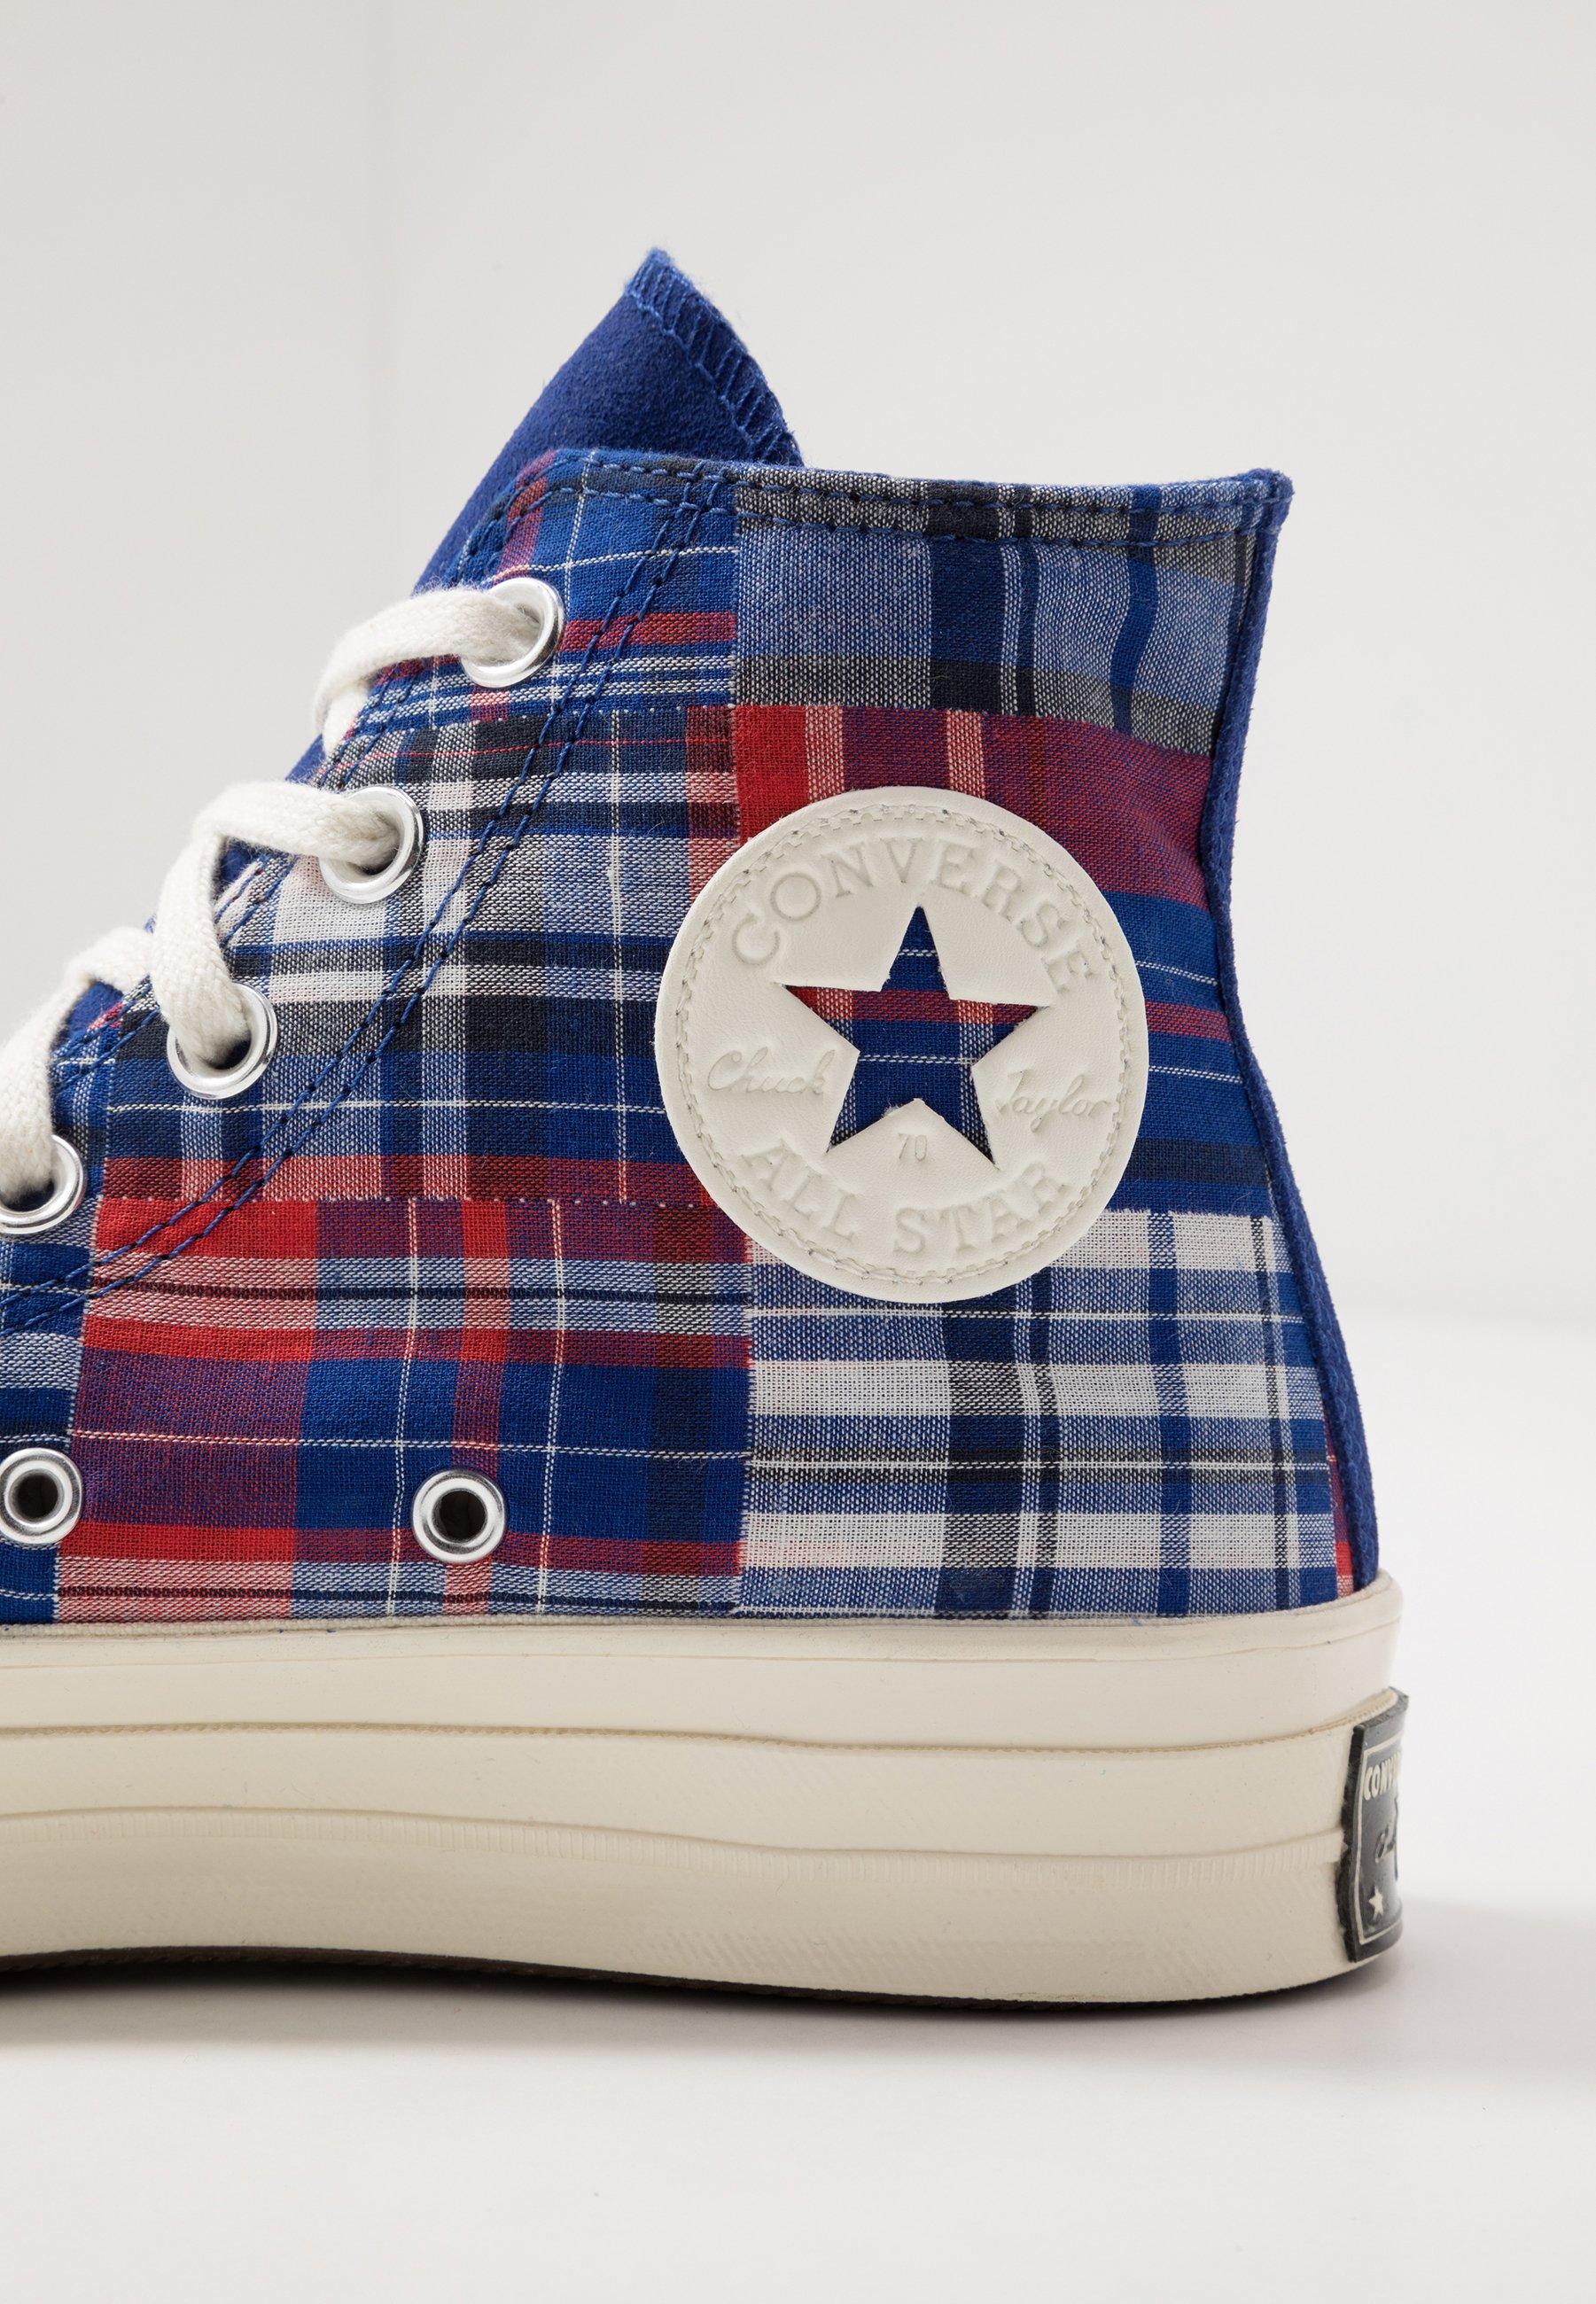 Converse Chuck Taylor All Star 70 - Höga Sneakers Rush Blue/university Red/obsidian